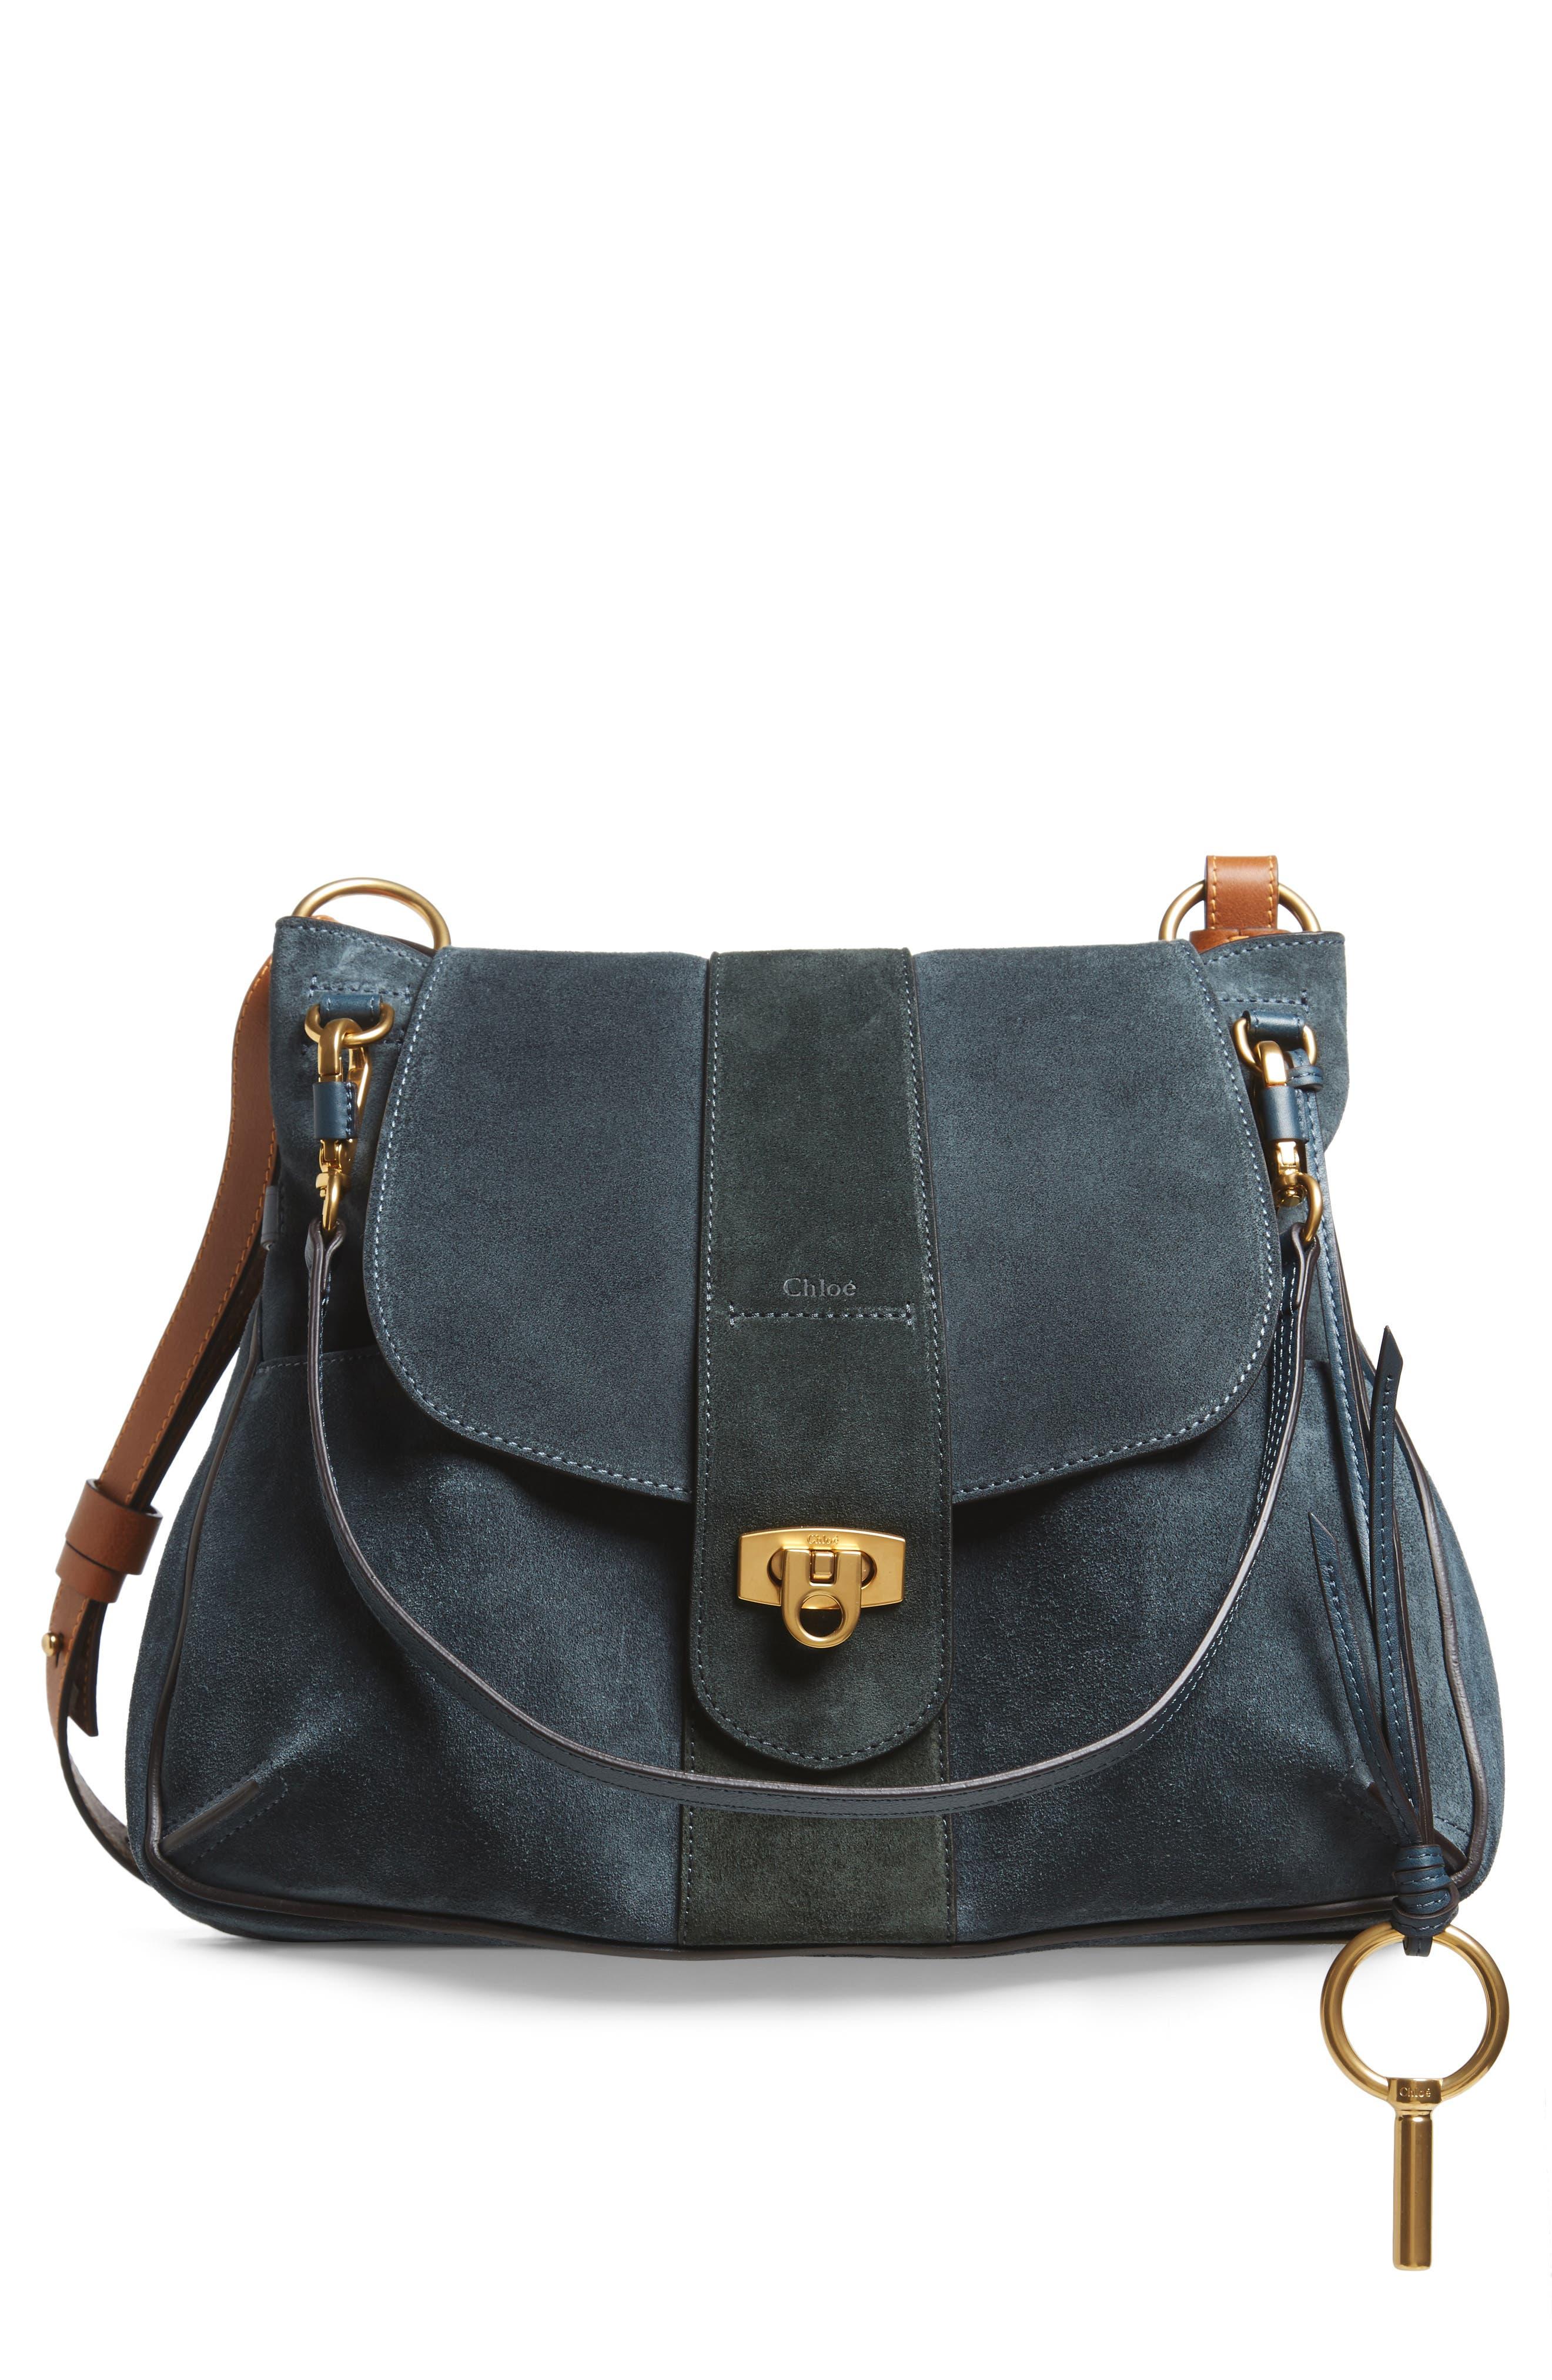 Medium Lexa Leather Shoulder Bag,                             Main thumbnail 2, color,